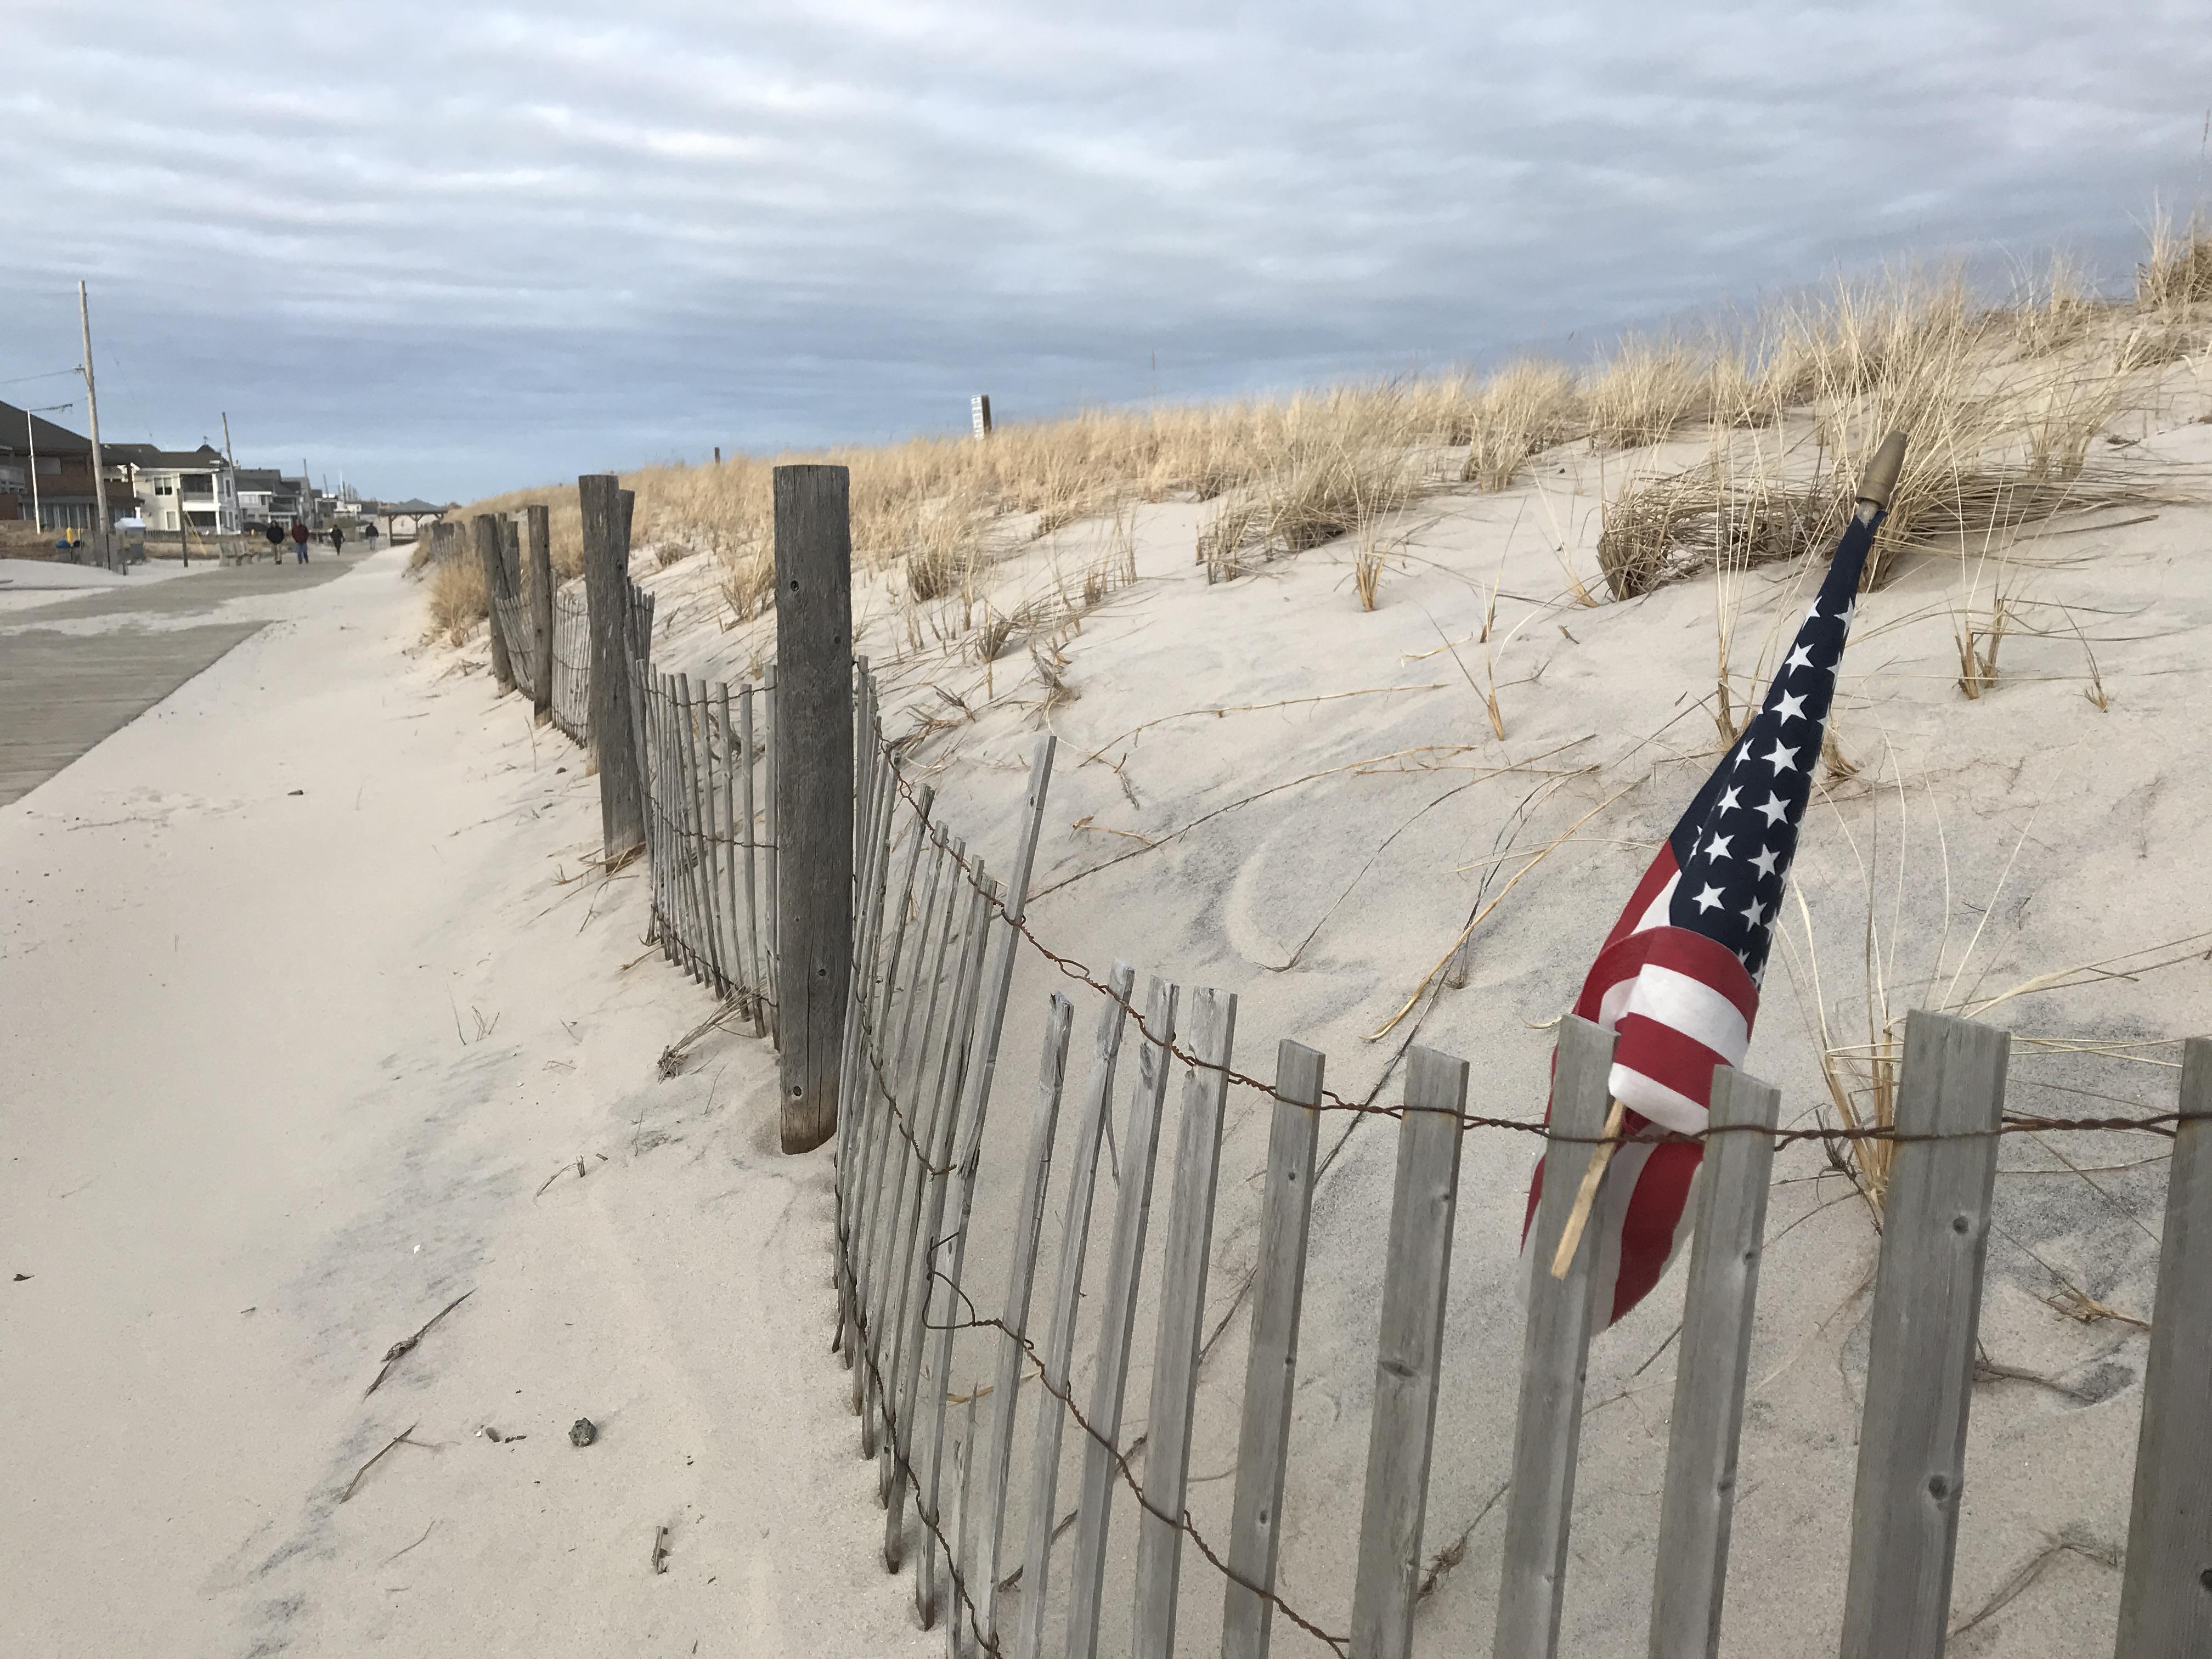 The Lavallette dunes and boardwalk, Jan. 23, 2019. (Photo: Daniel Nee)